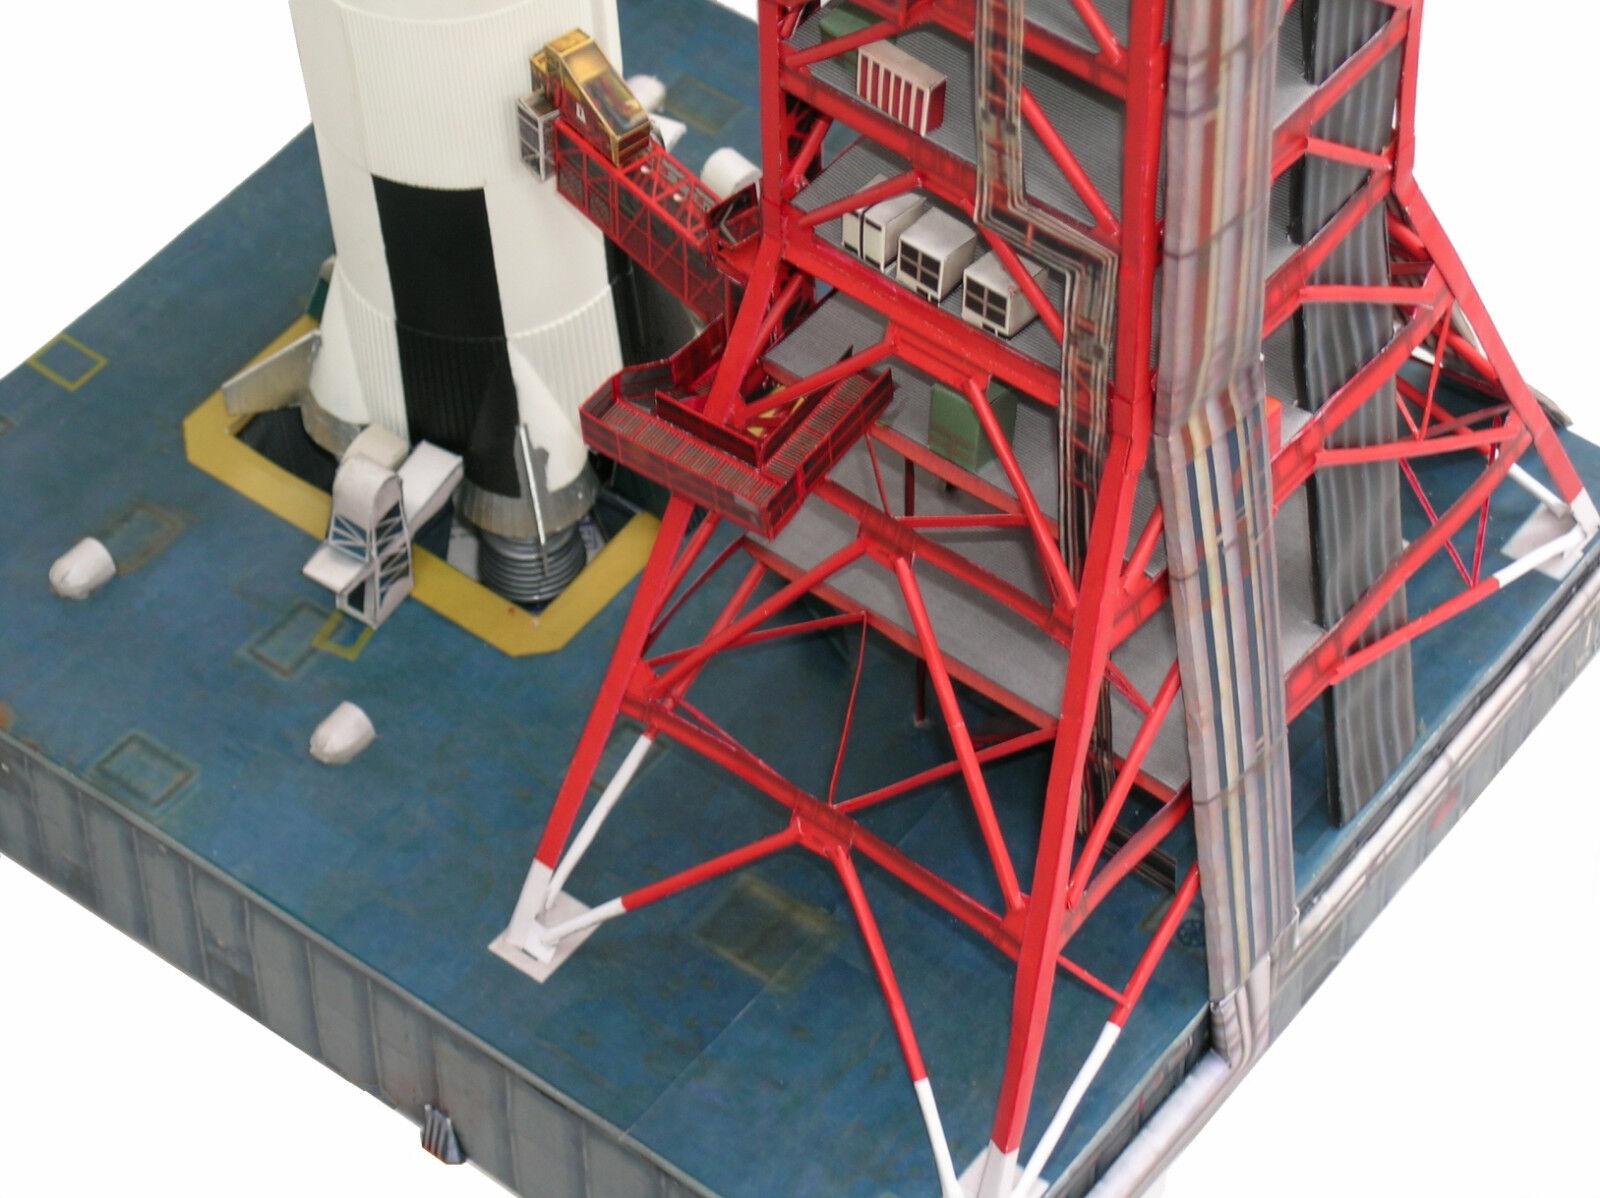 Launch Umbilical Tower LUT Craft Model for Monogram,Airfix 144 Saturn V PLS.READ